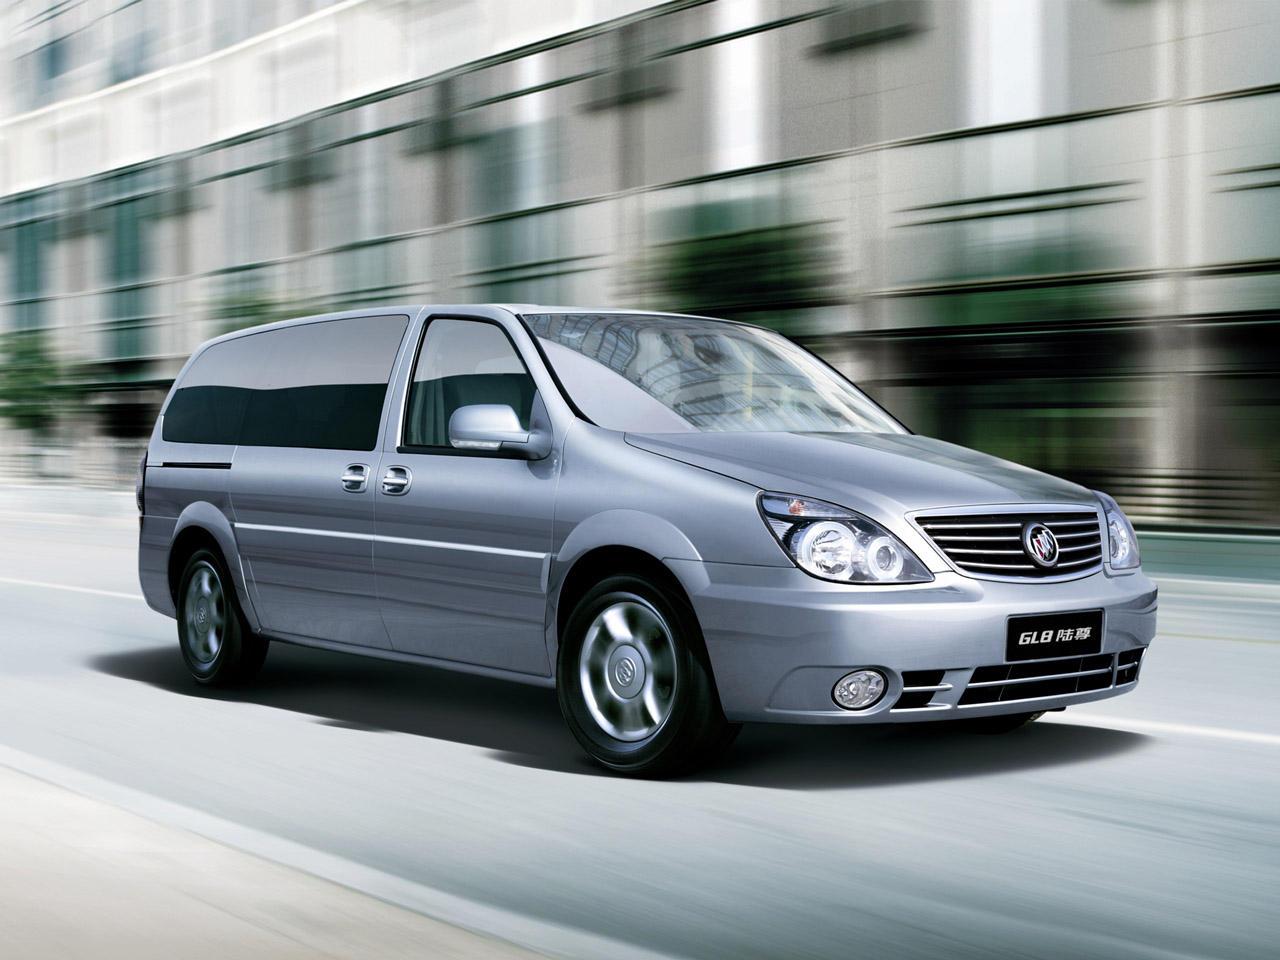 Buick обновил минивэн GL8 прошлого поколения